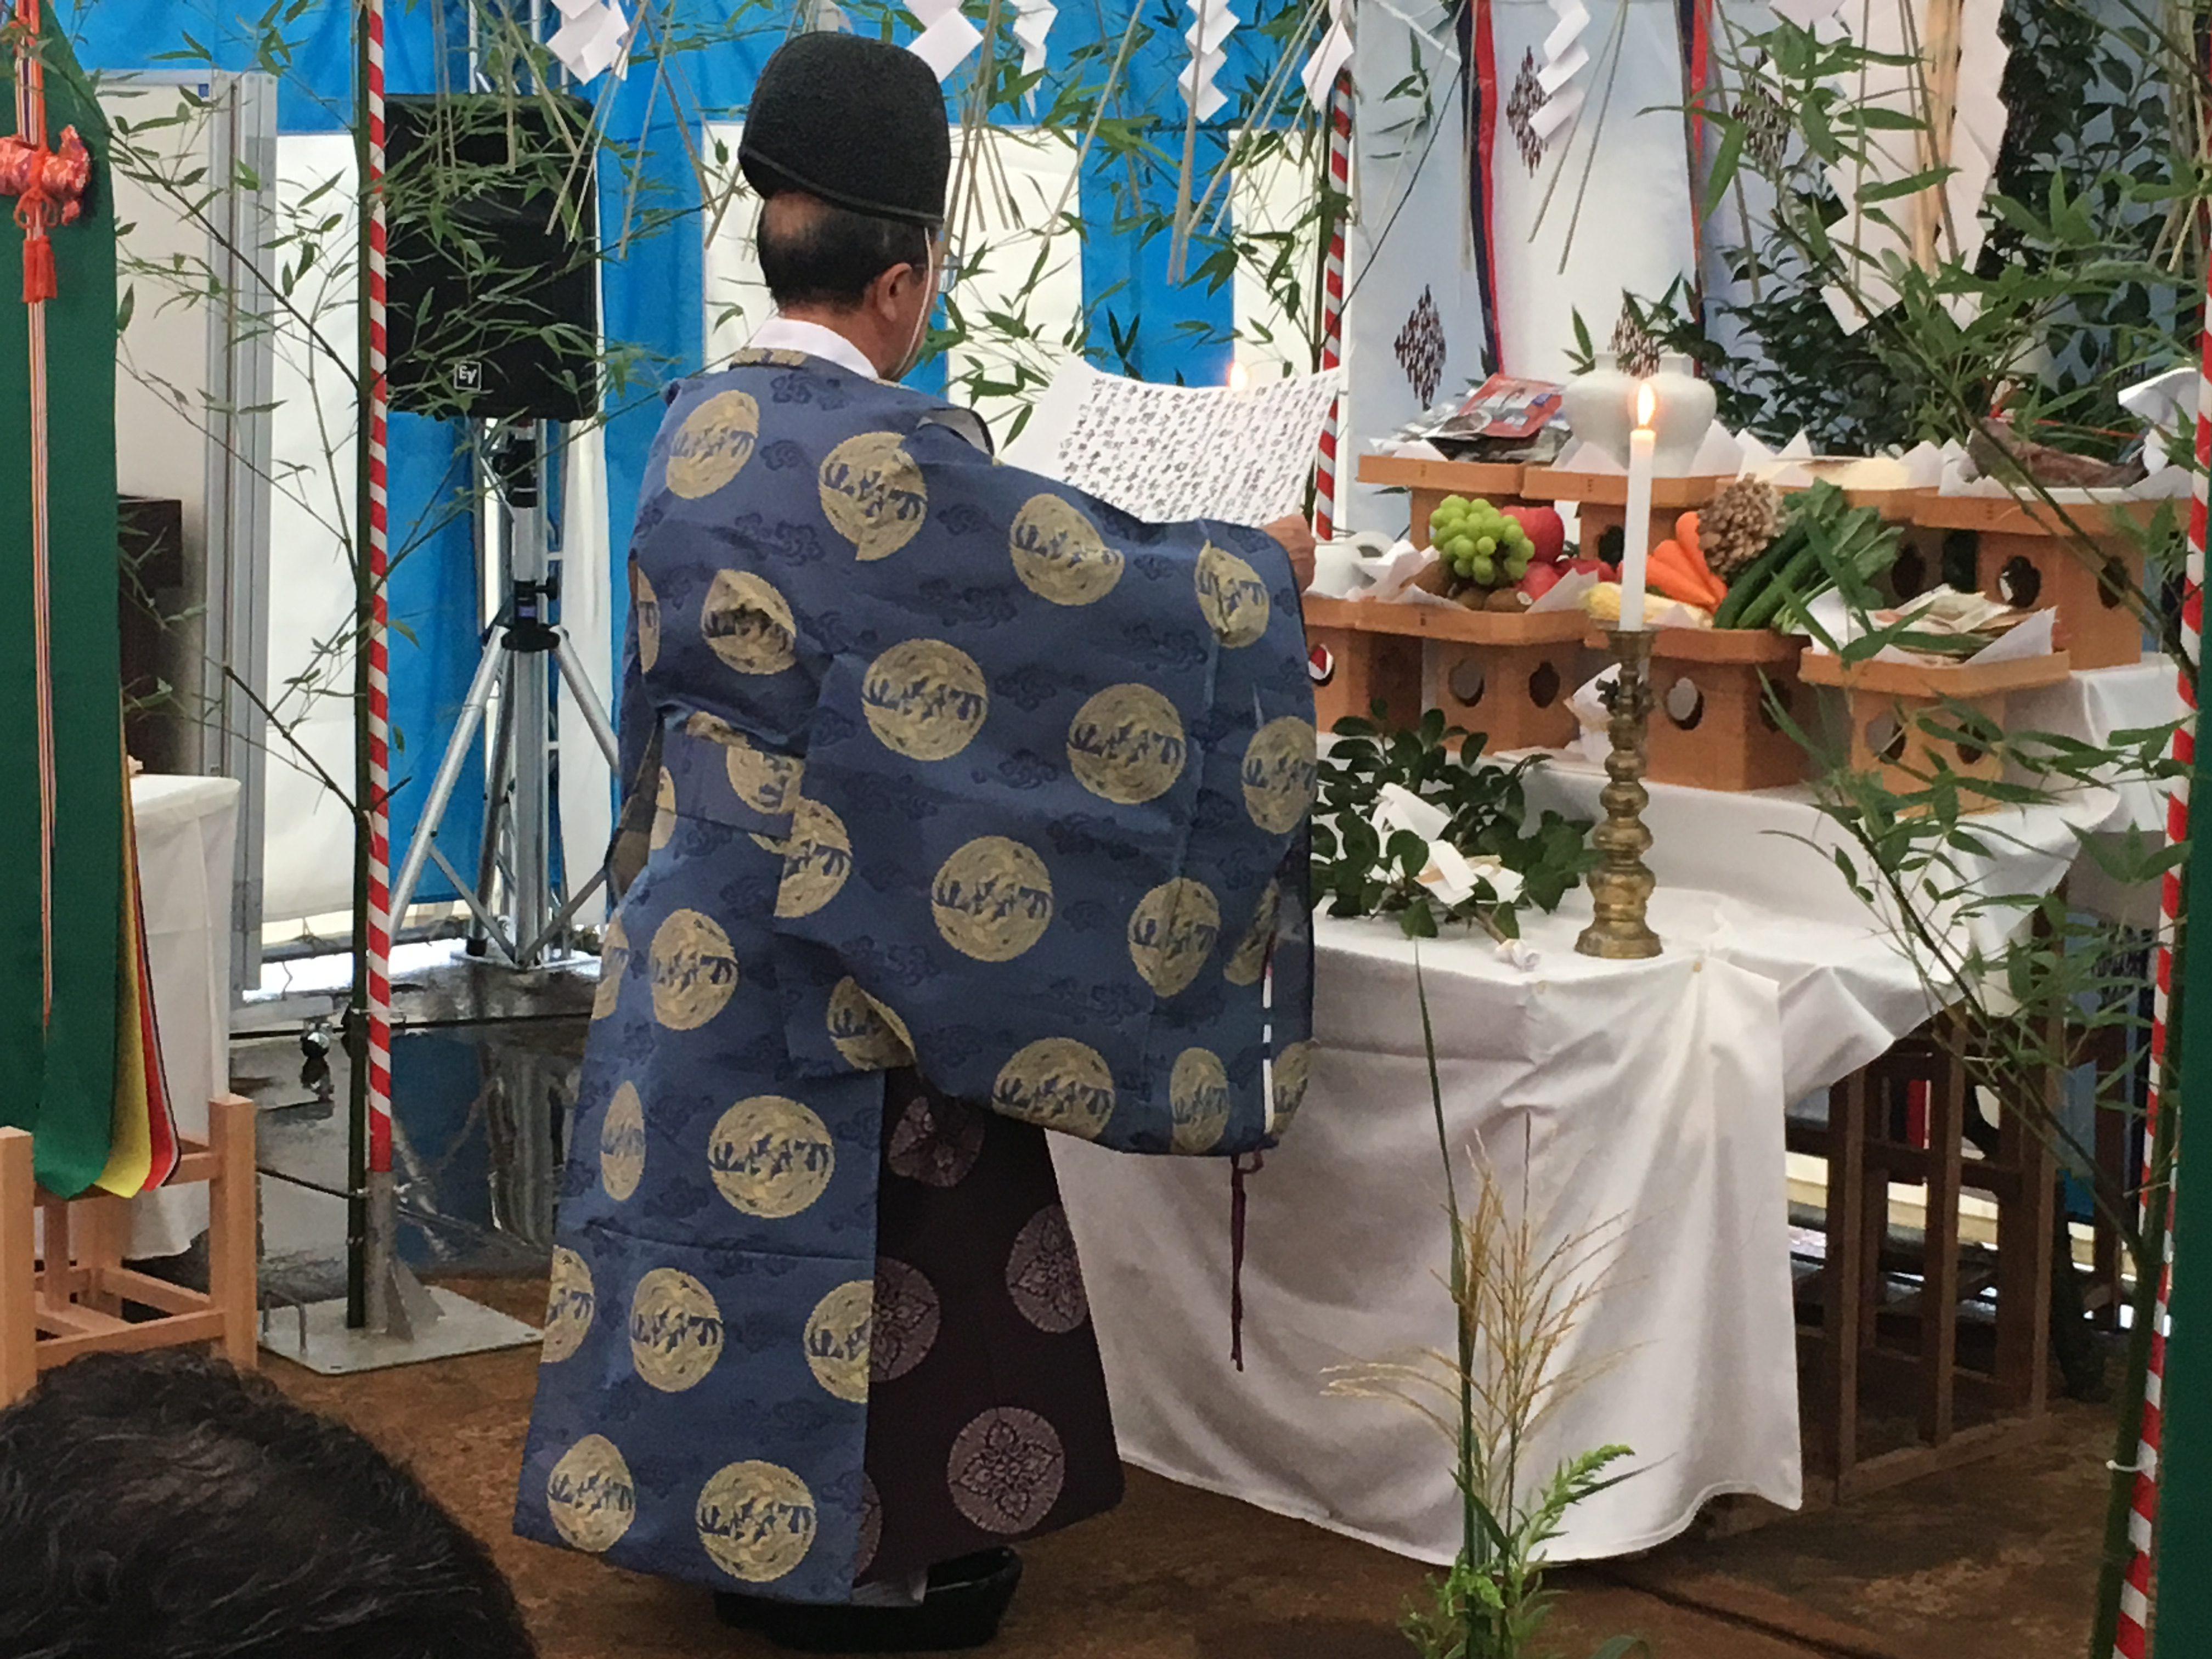 IMG_1安全祈願祭9月11日(水)